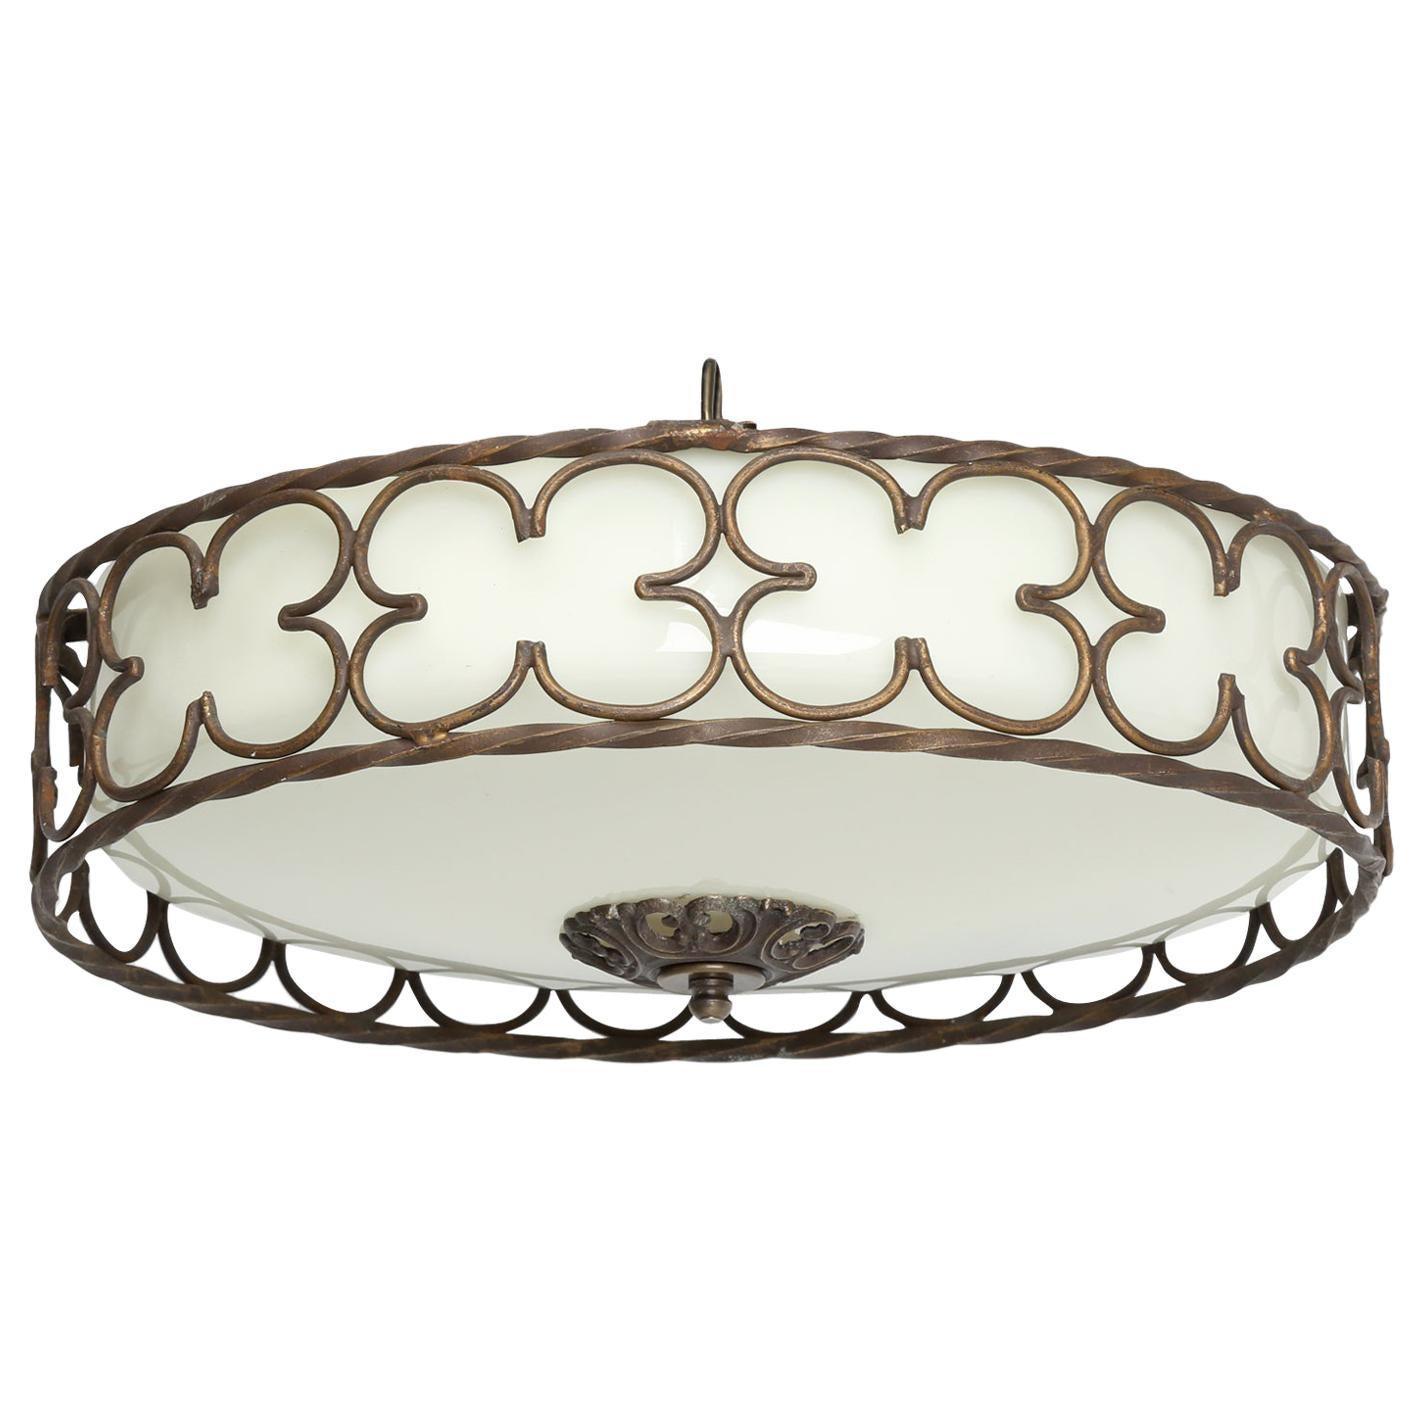 Vintage American Chandelier or Ceiling Light